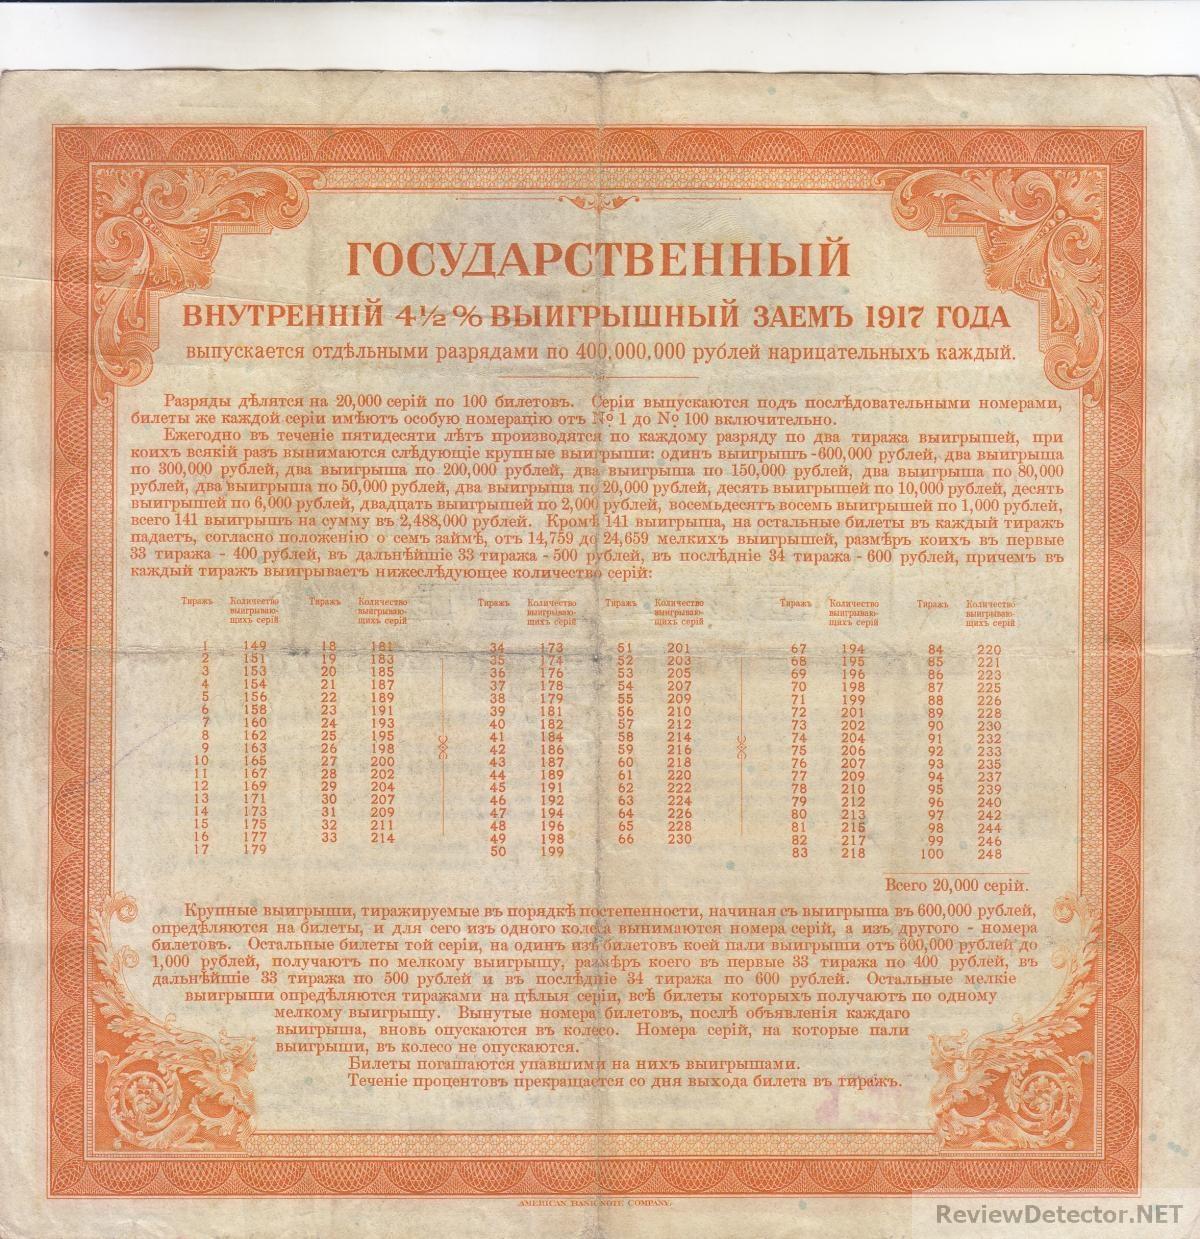 КОЛЧАК. ИРКУТСК. 200 рублей. 1917. Разряд 2 (700) 2.jpg